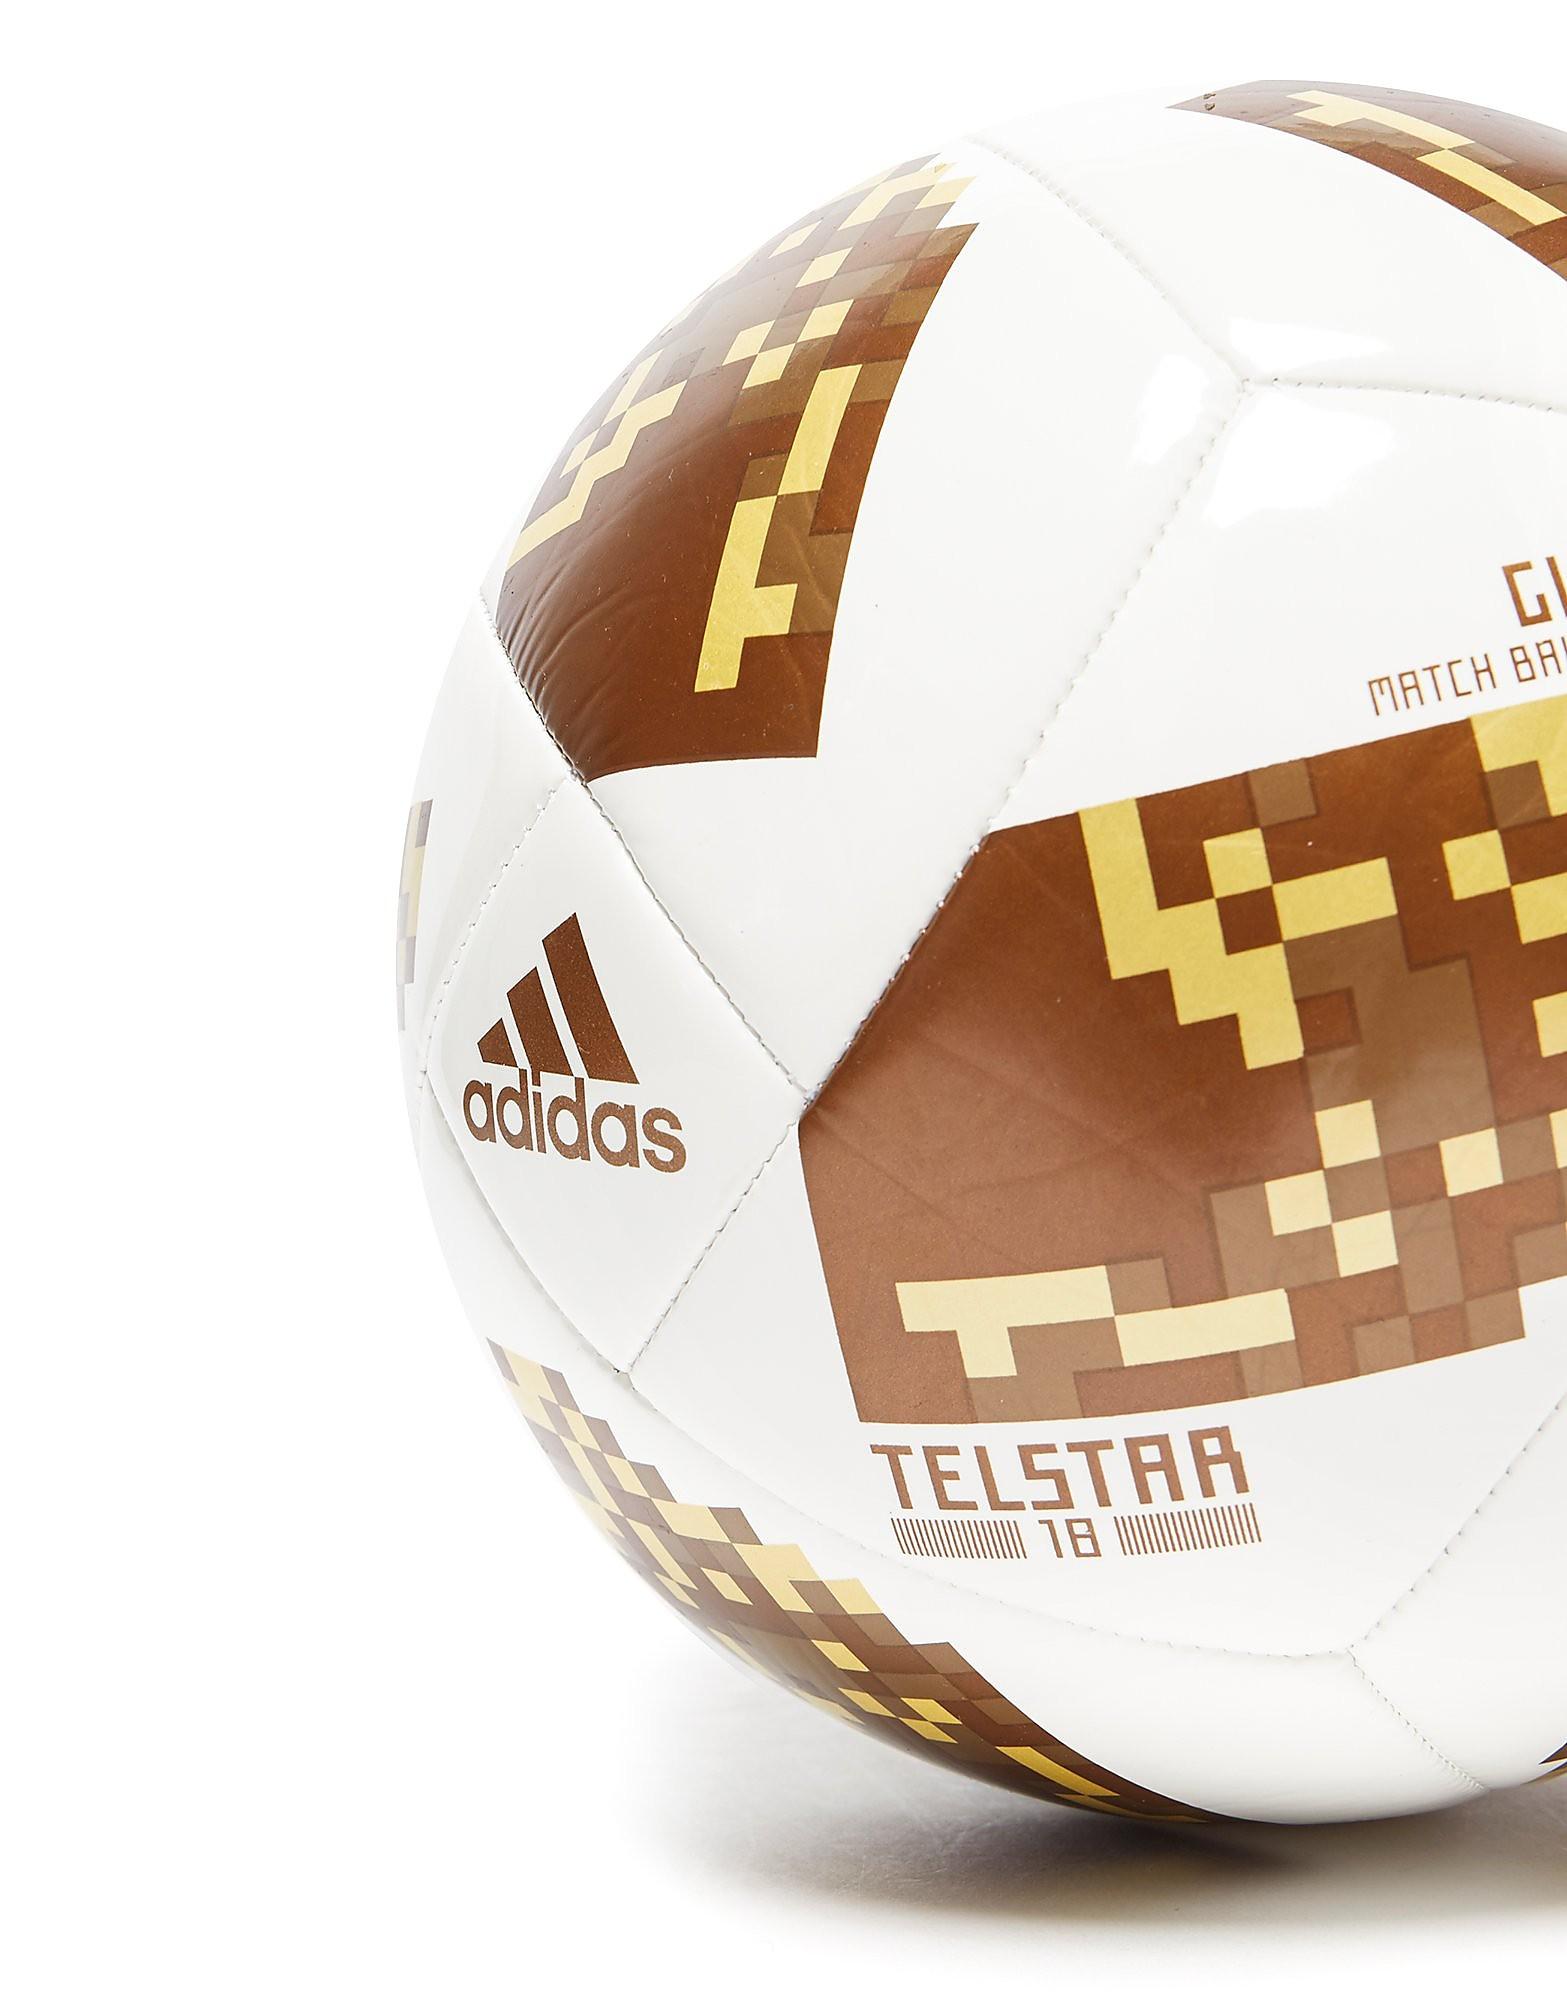 adidas World Cup 2018 Glide Ball